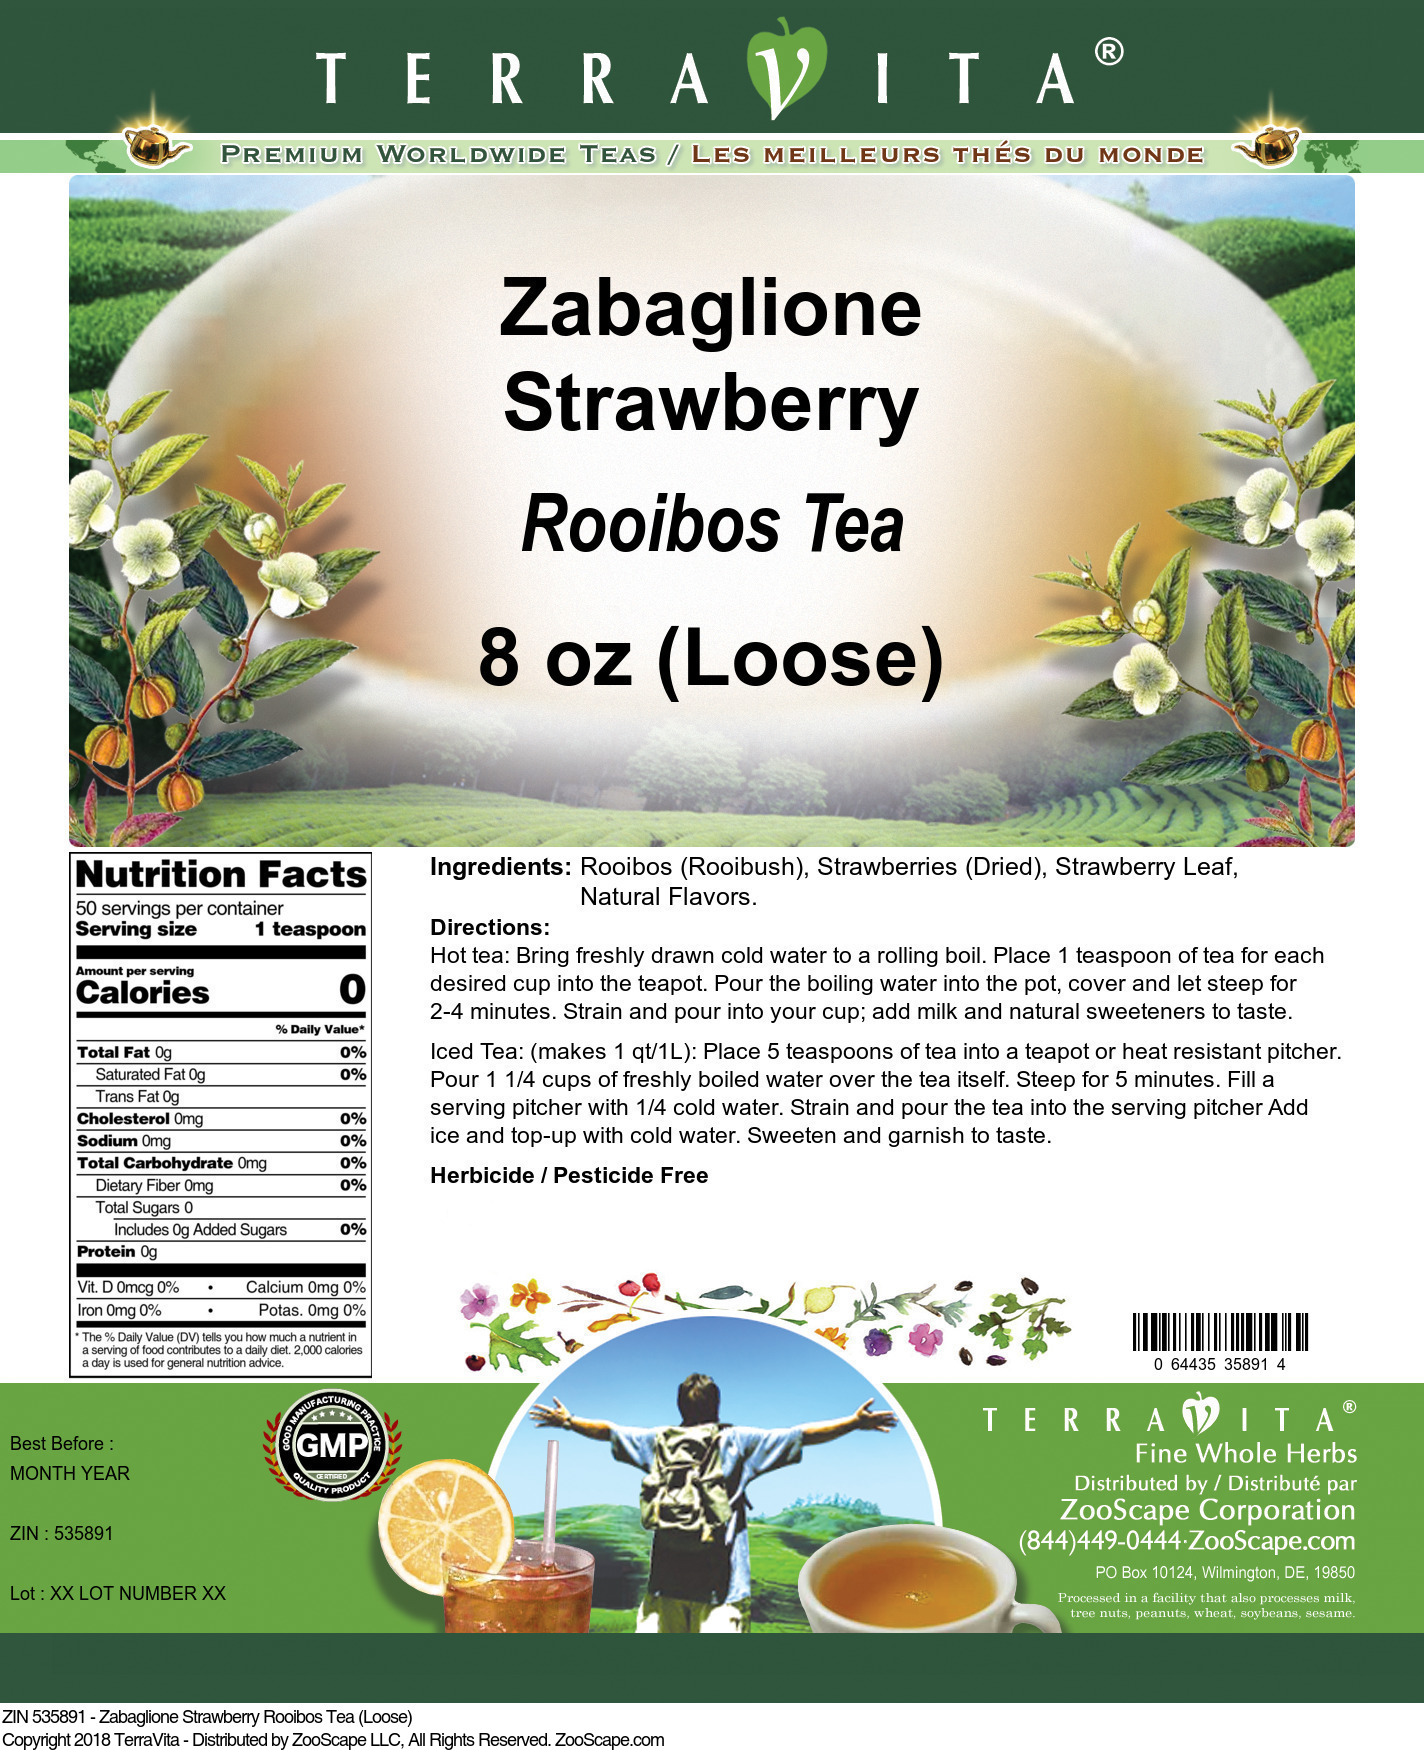 Zabaglione Strawberry Rooibos Tea (Loose)